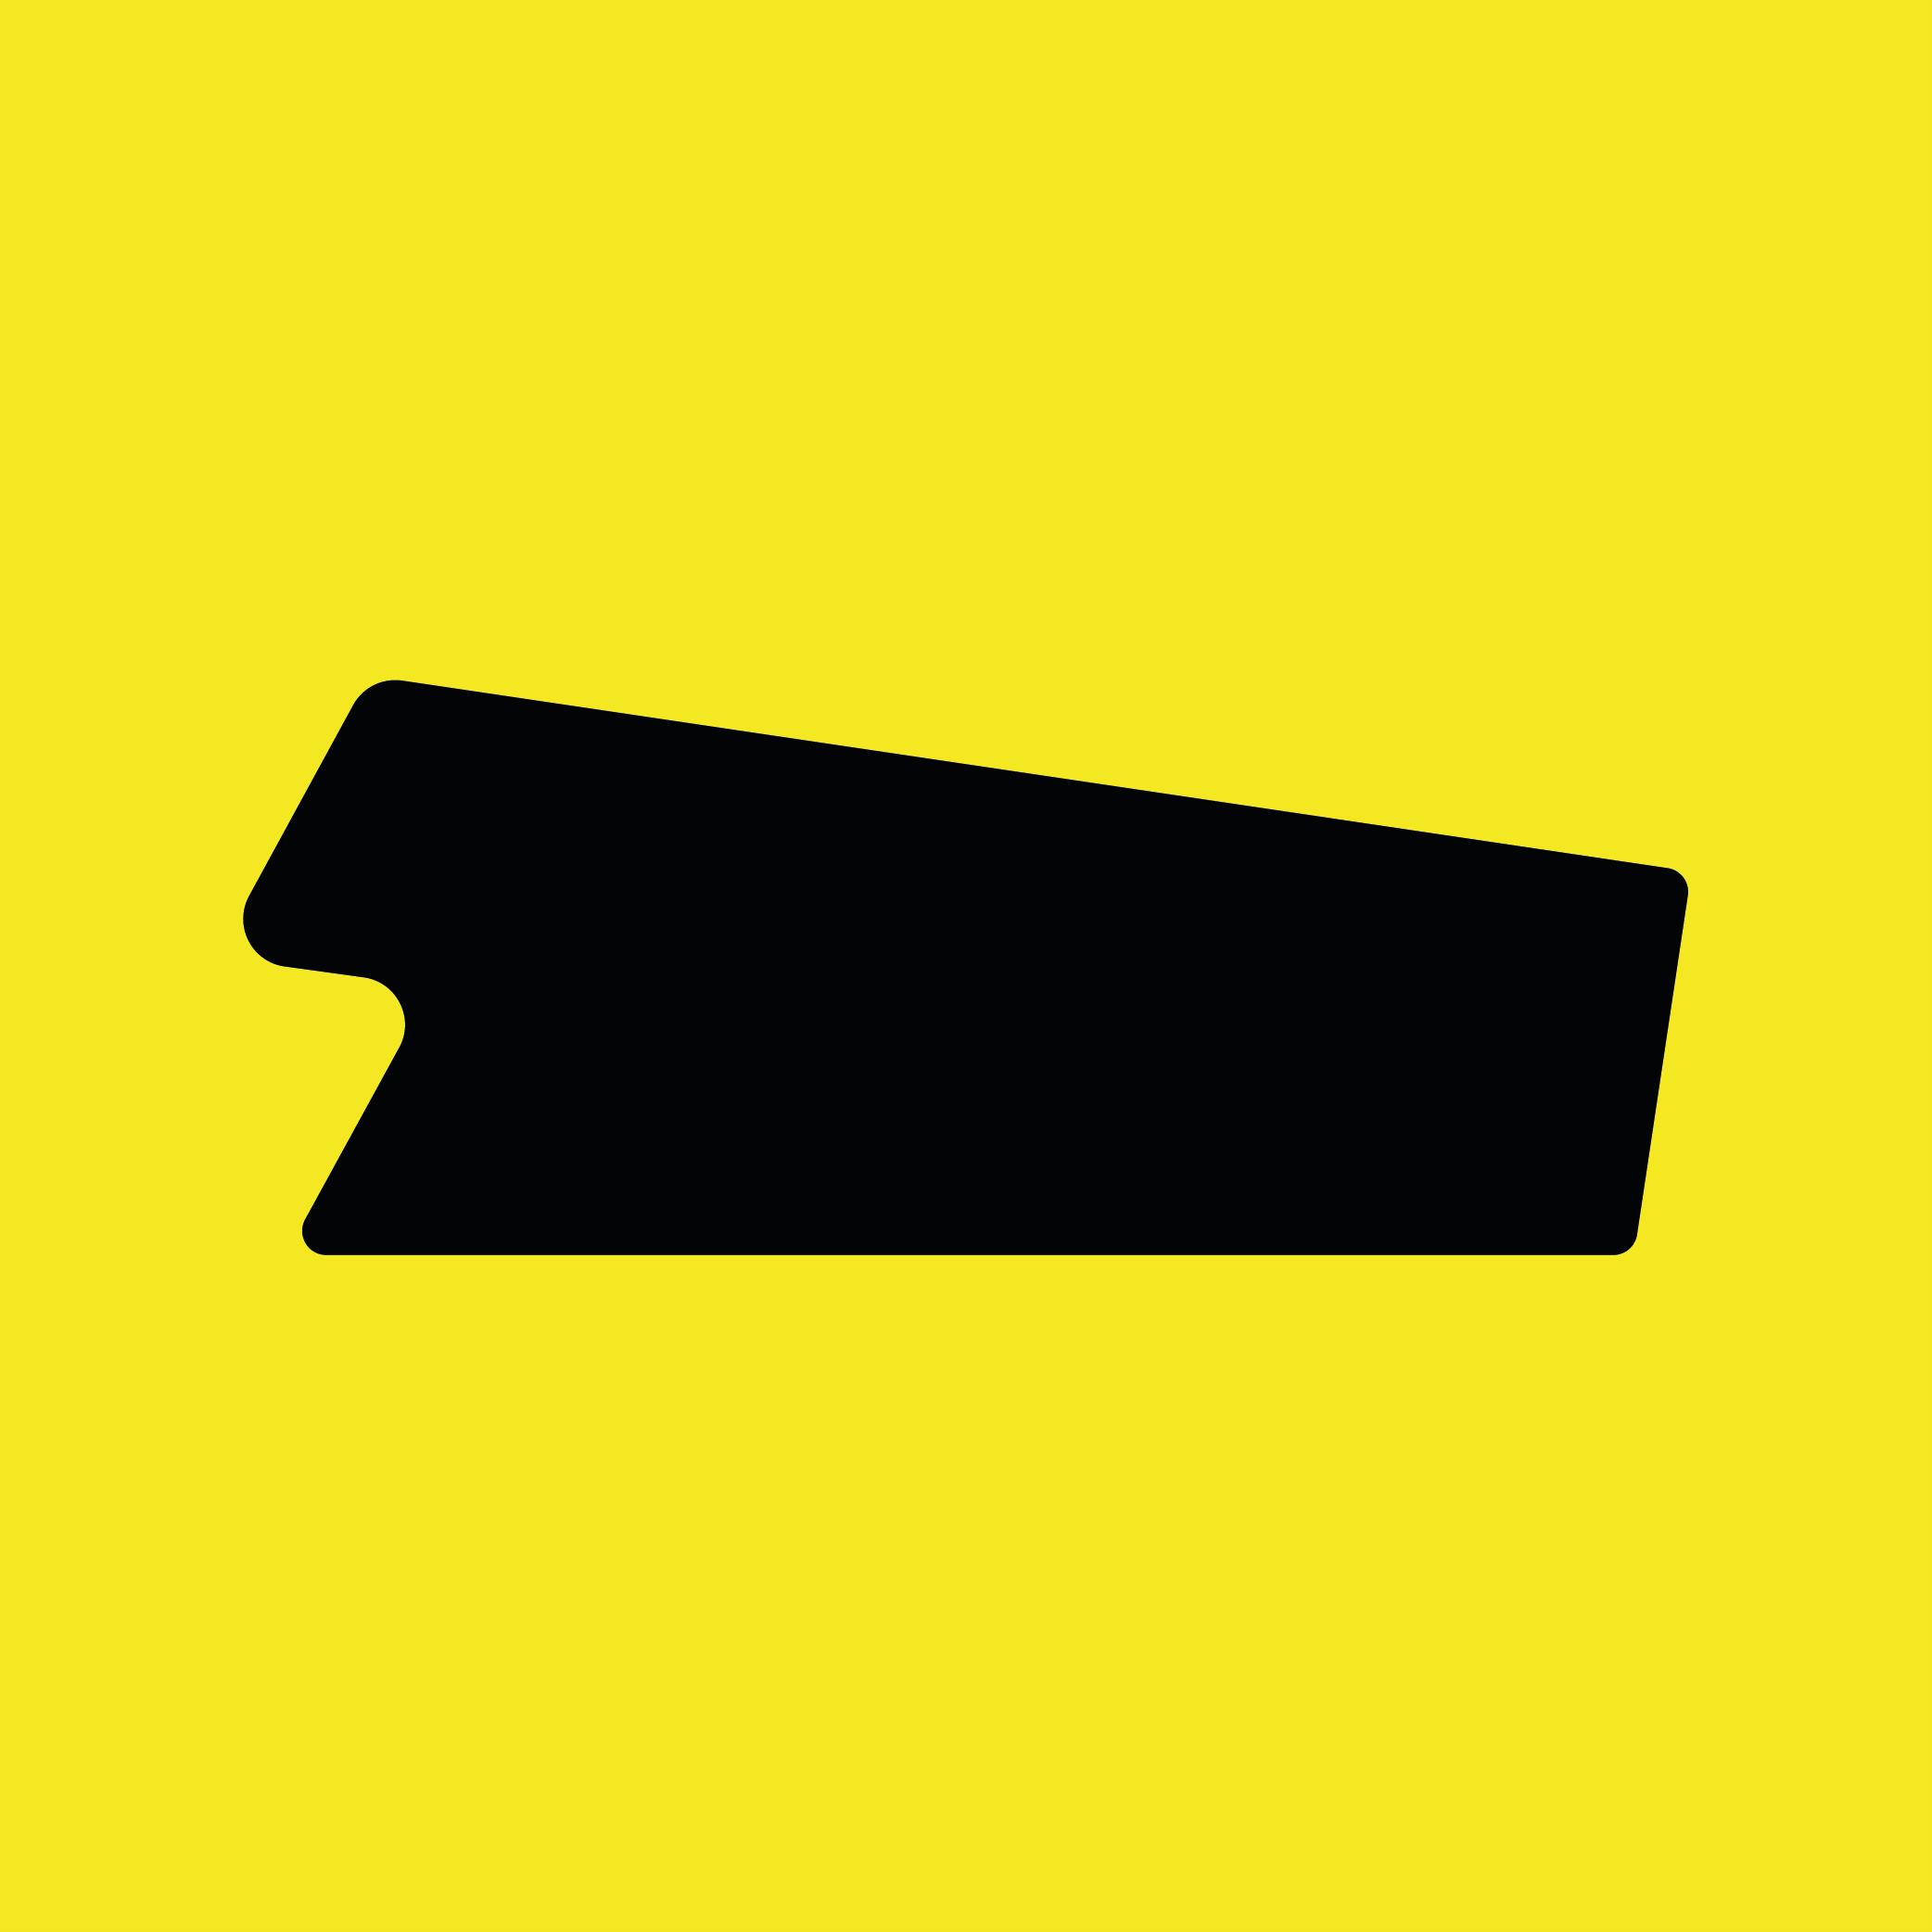 Logo yellow black b5bw6jfhax